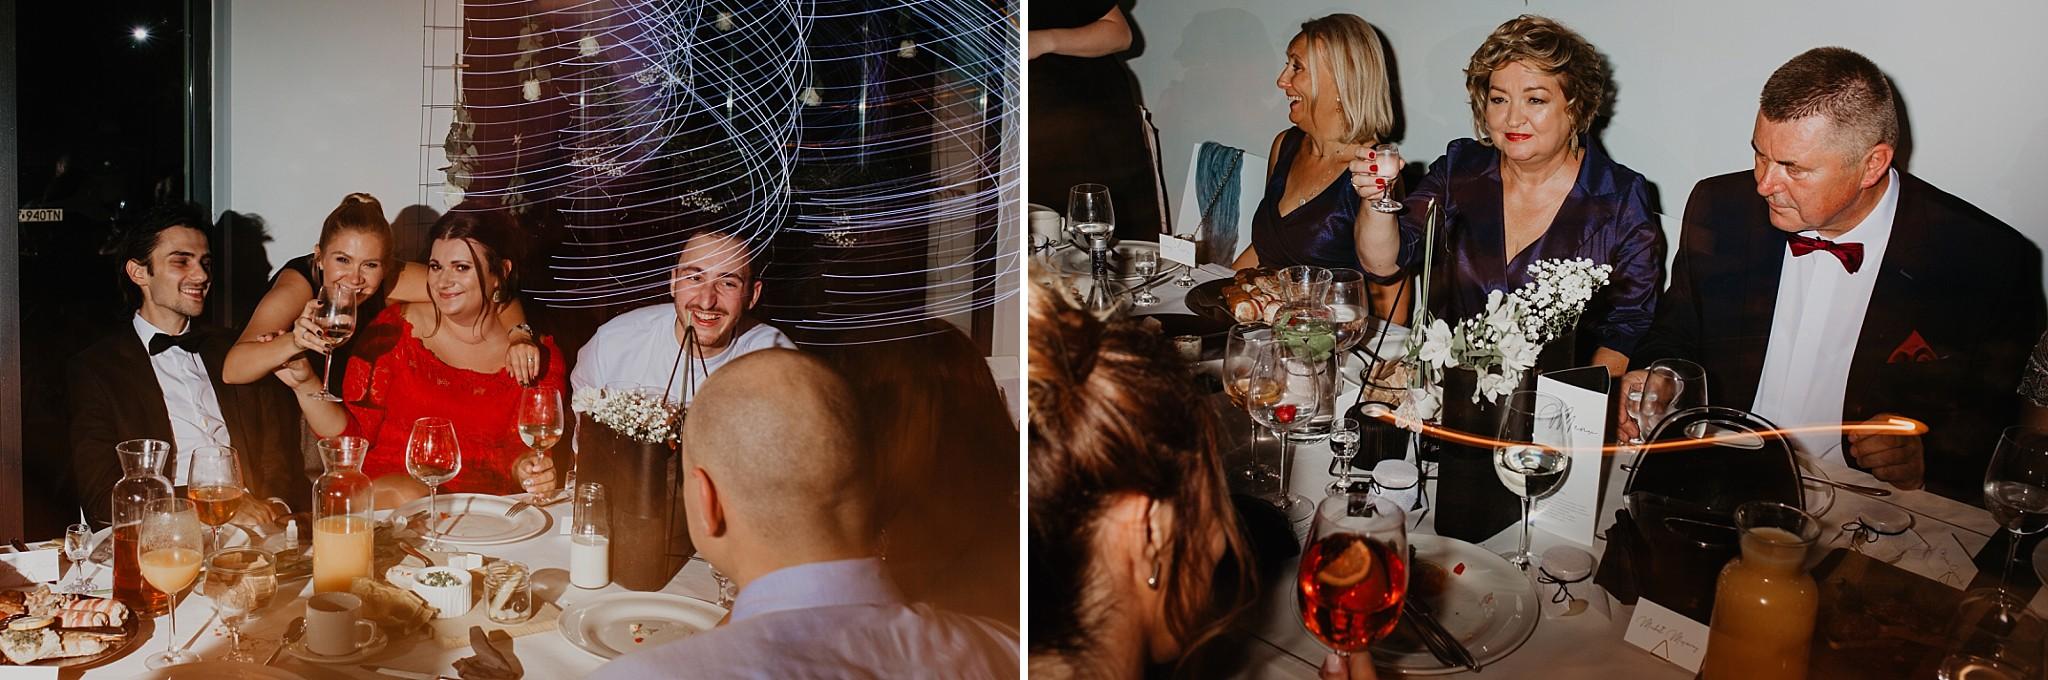 fotograf poznan wesele dobra truskawka piekne wesele pod poznaniem wesele w dobrej truskawce piekna para mloda slub marzen slub koronawirus slub listopad wesele koronawirus 441